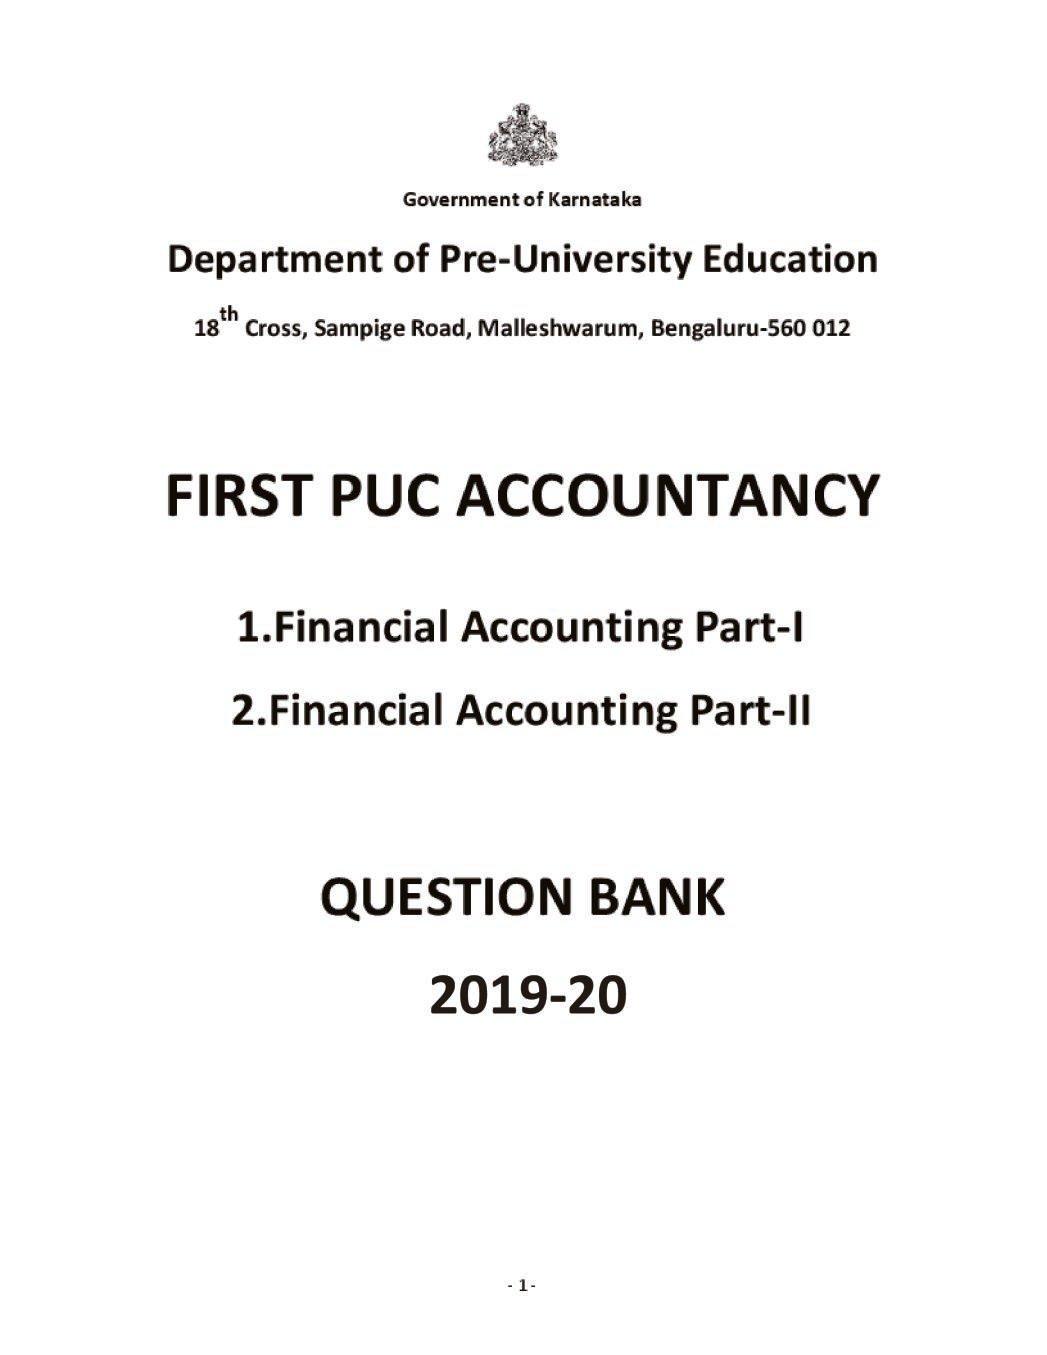 Karnataka 1st PUC Question Bank for Accountancy 2019-20 - Page 1